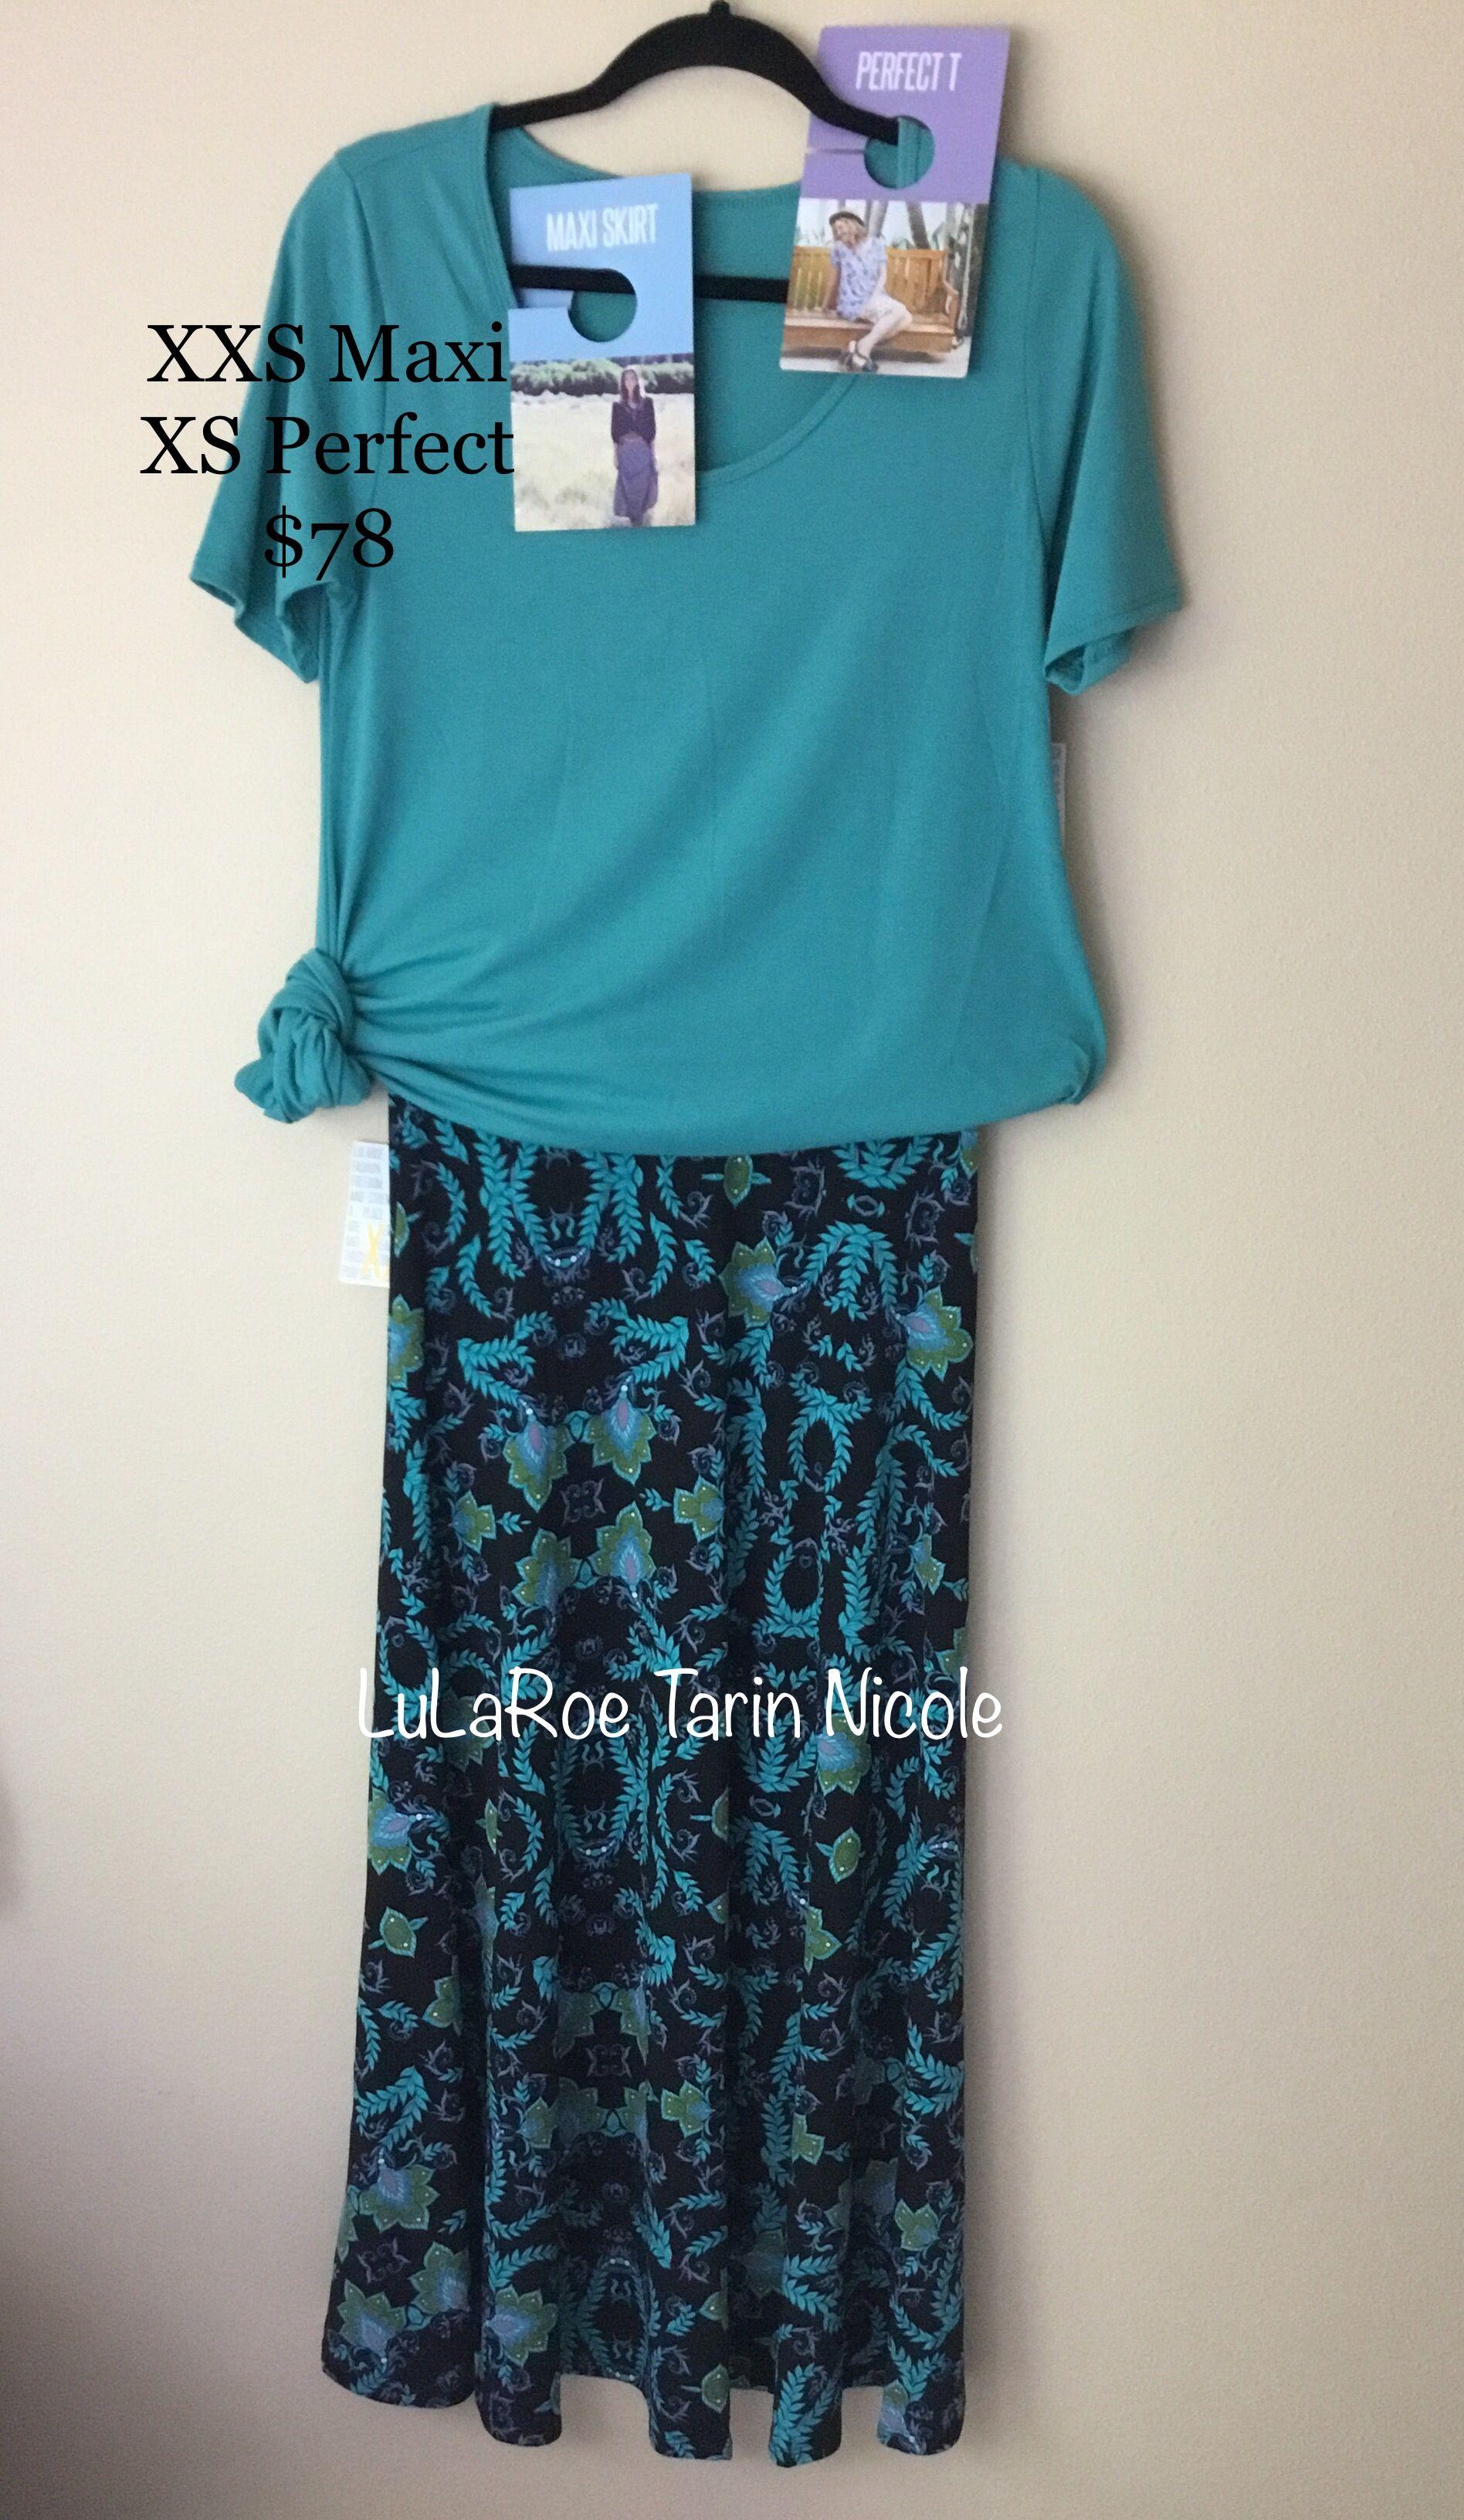 2aaaa87b65ad53 Find this Pin and more on LuLaRoe Tarin Nicole by MamaTarin. See More. Turn  your LuLaRoe Nicole into a sleeveless dress.  TrinityLuLaRoe   LuLaRoeJaimeThomas